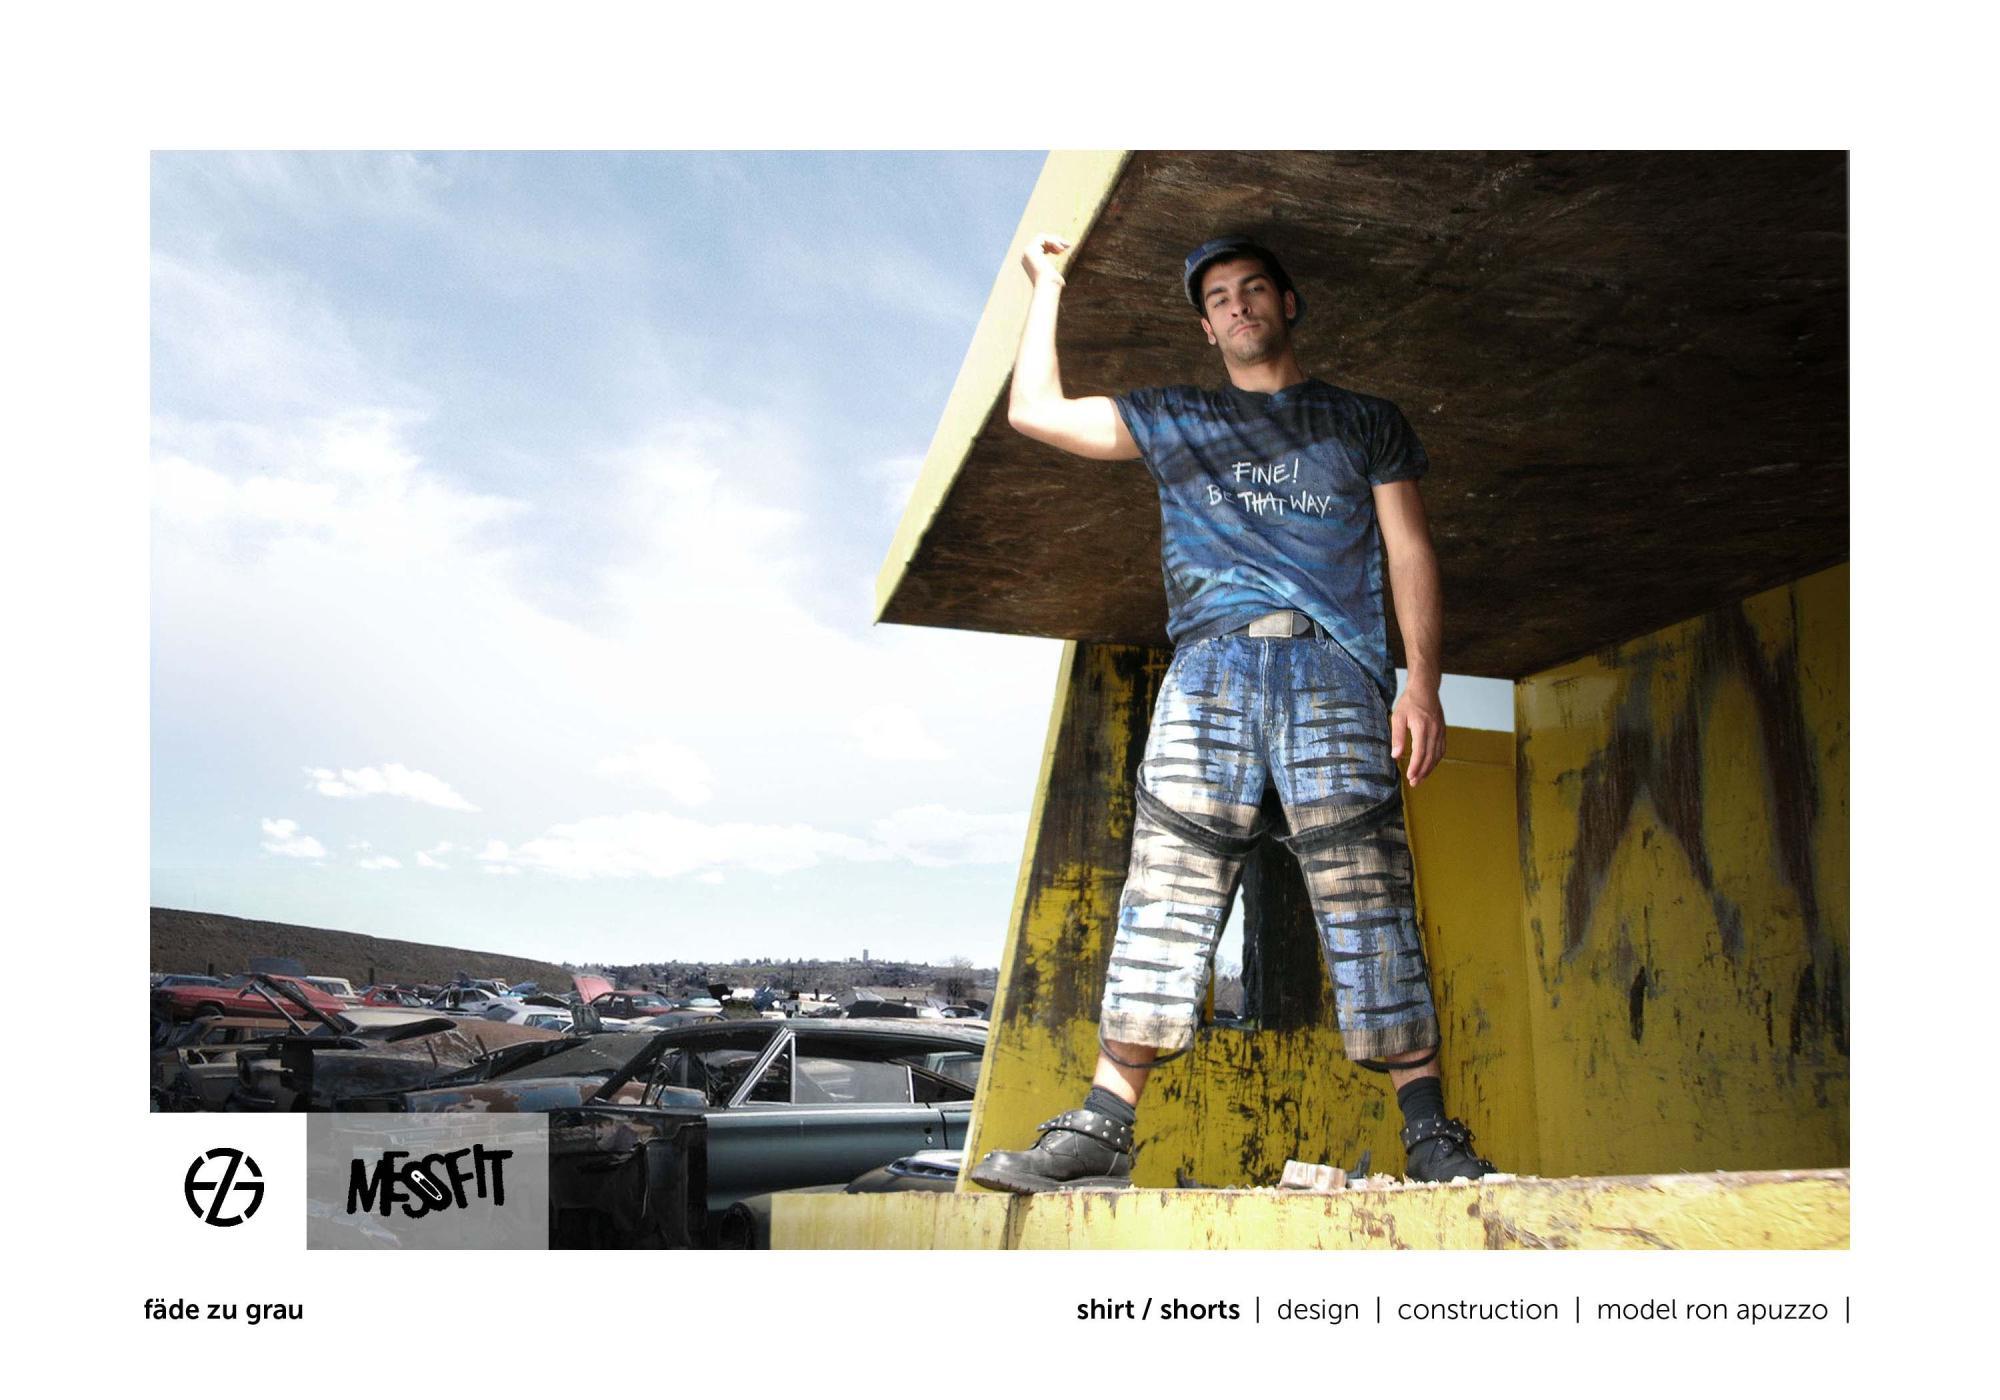 fäde zu grau | photo shoot | shirt, pants